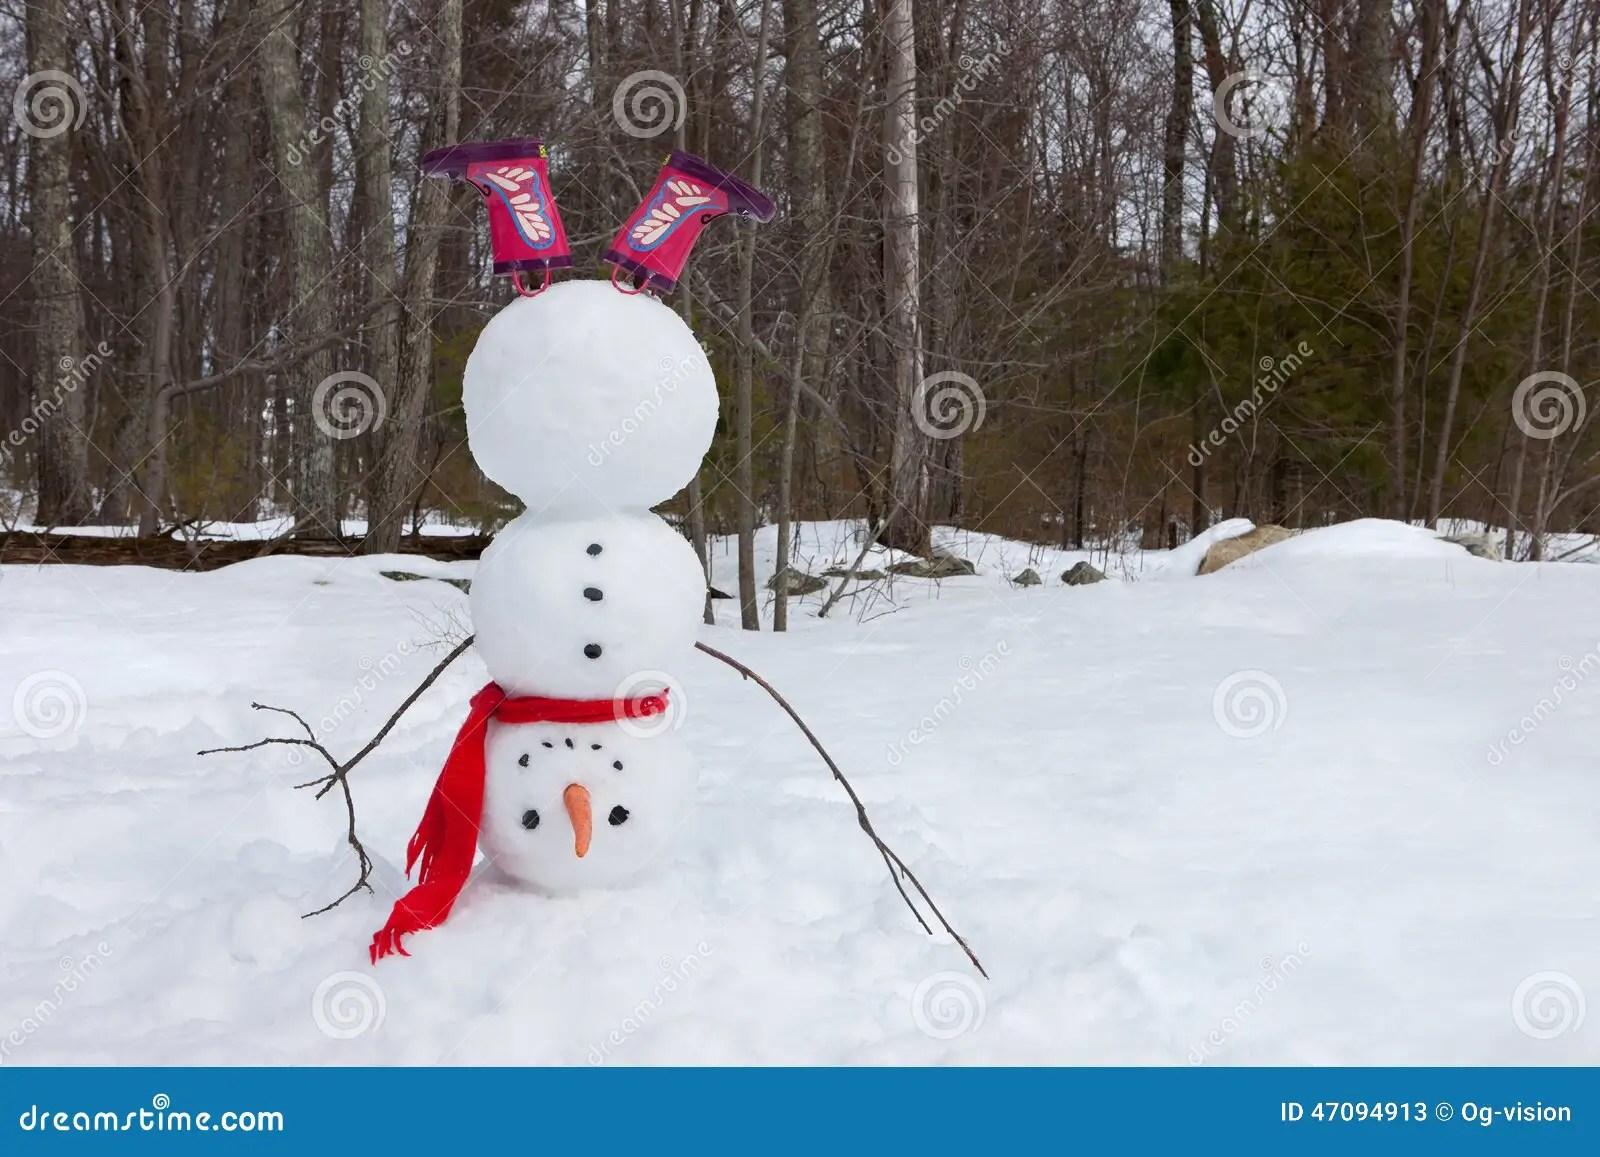 Upside Down Snowman Stock Photo Image 47094913